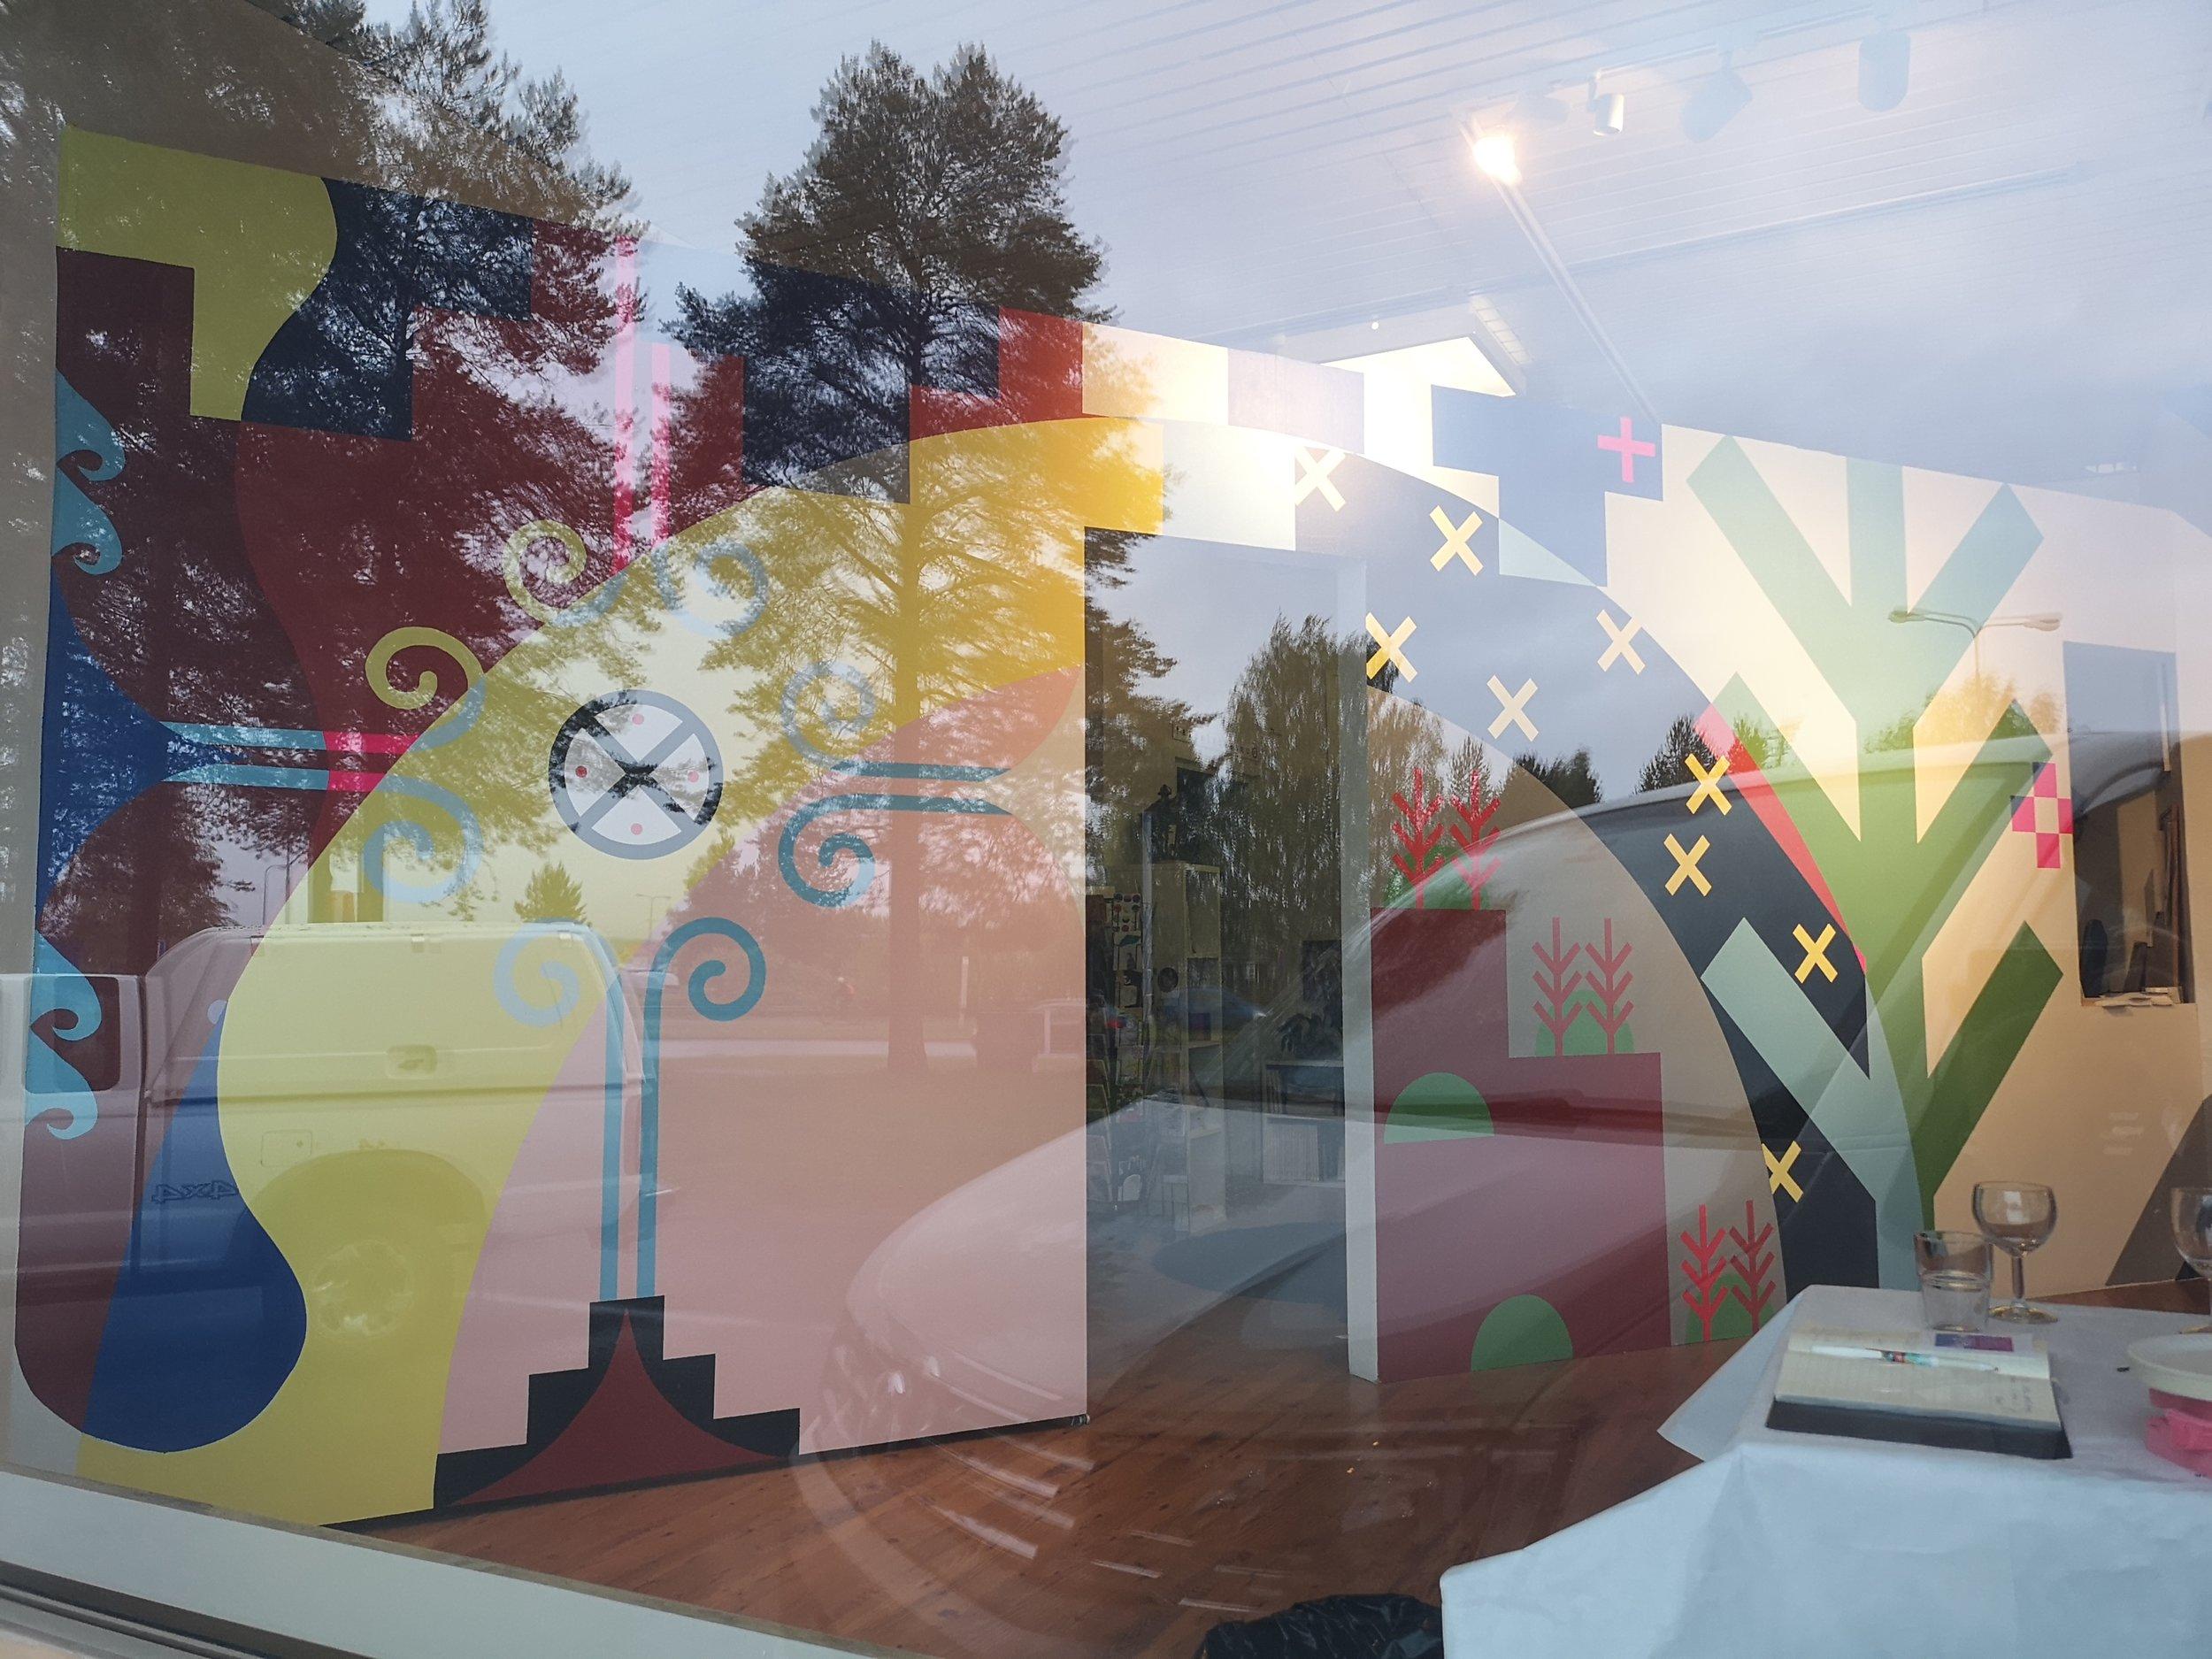 APUKNAJIT 1908 2019  Gallery Napa, Rovaniemi, Lapland, Finland  Materials:  Acylic paint on wall  Dimensions:  25'x9'